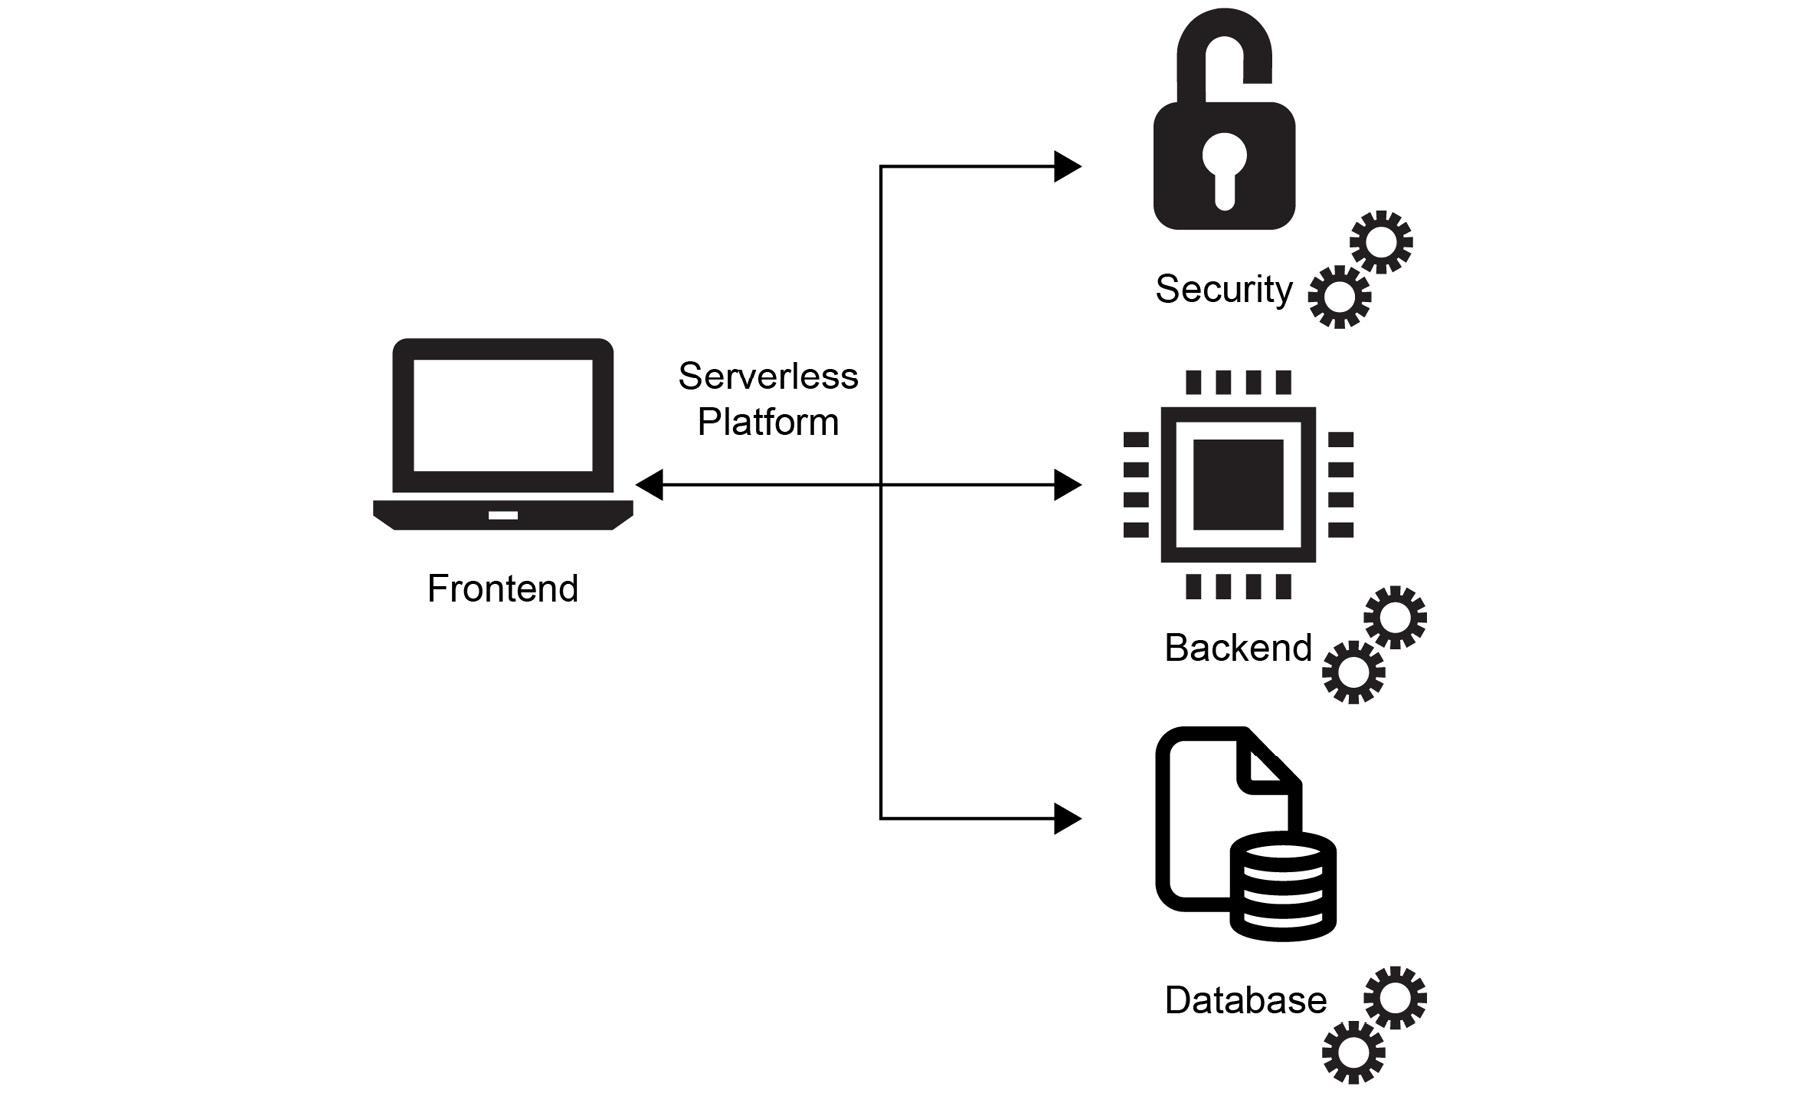 Figure 1.8: Serverless software architecture